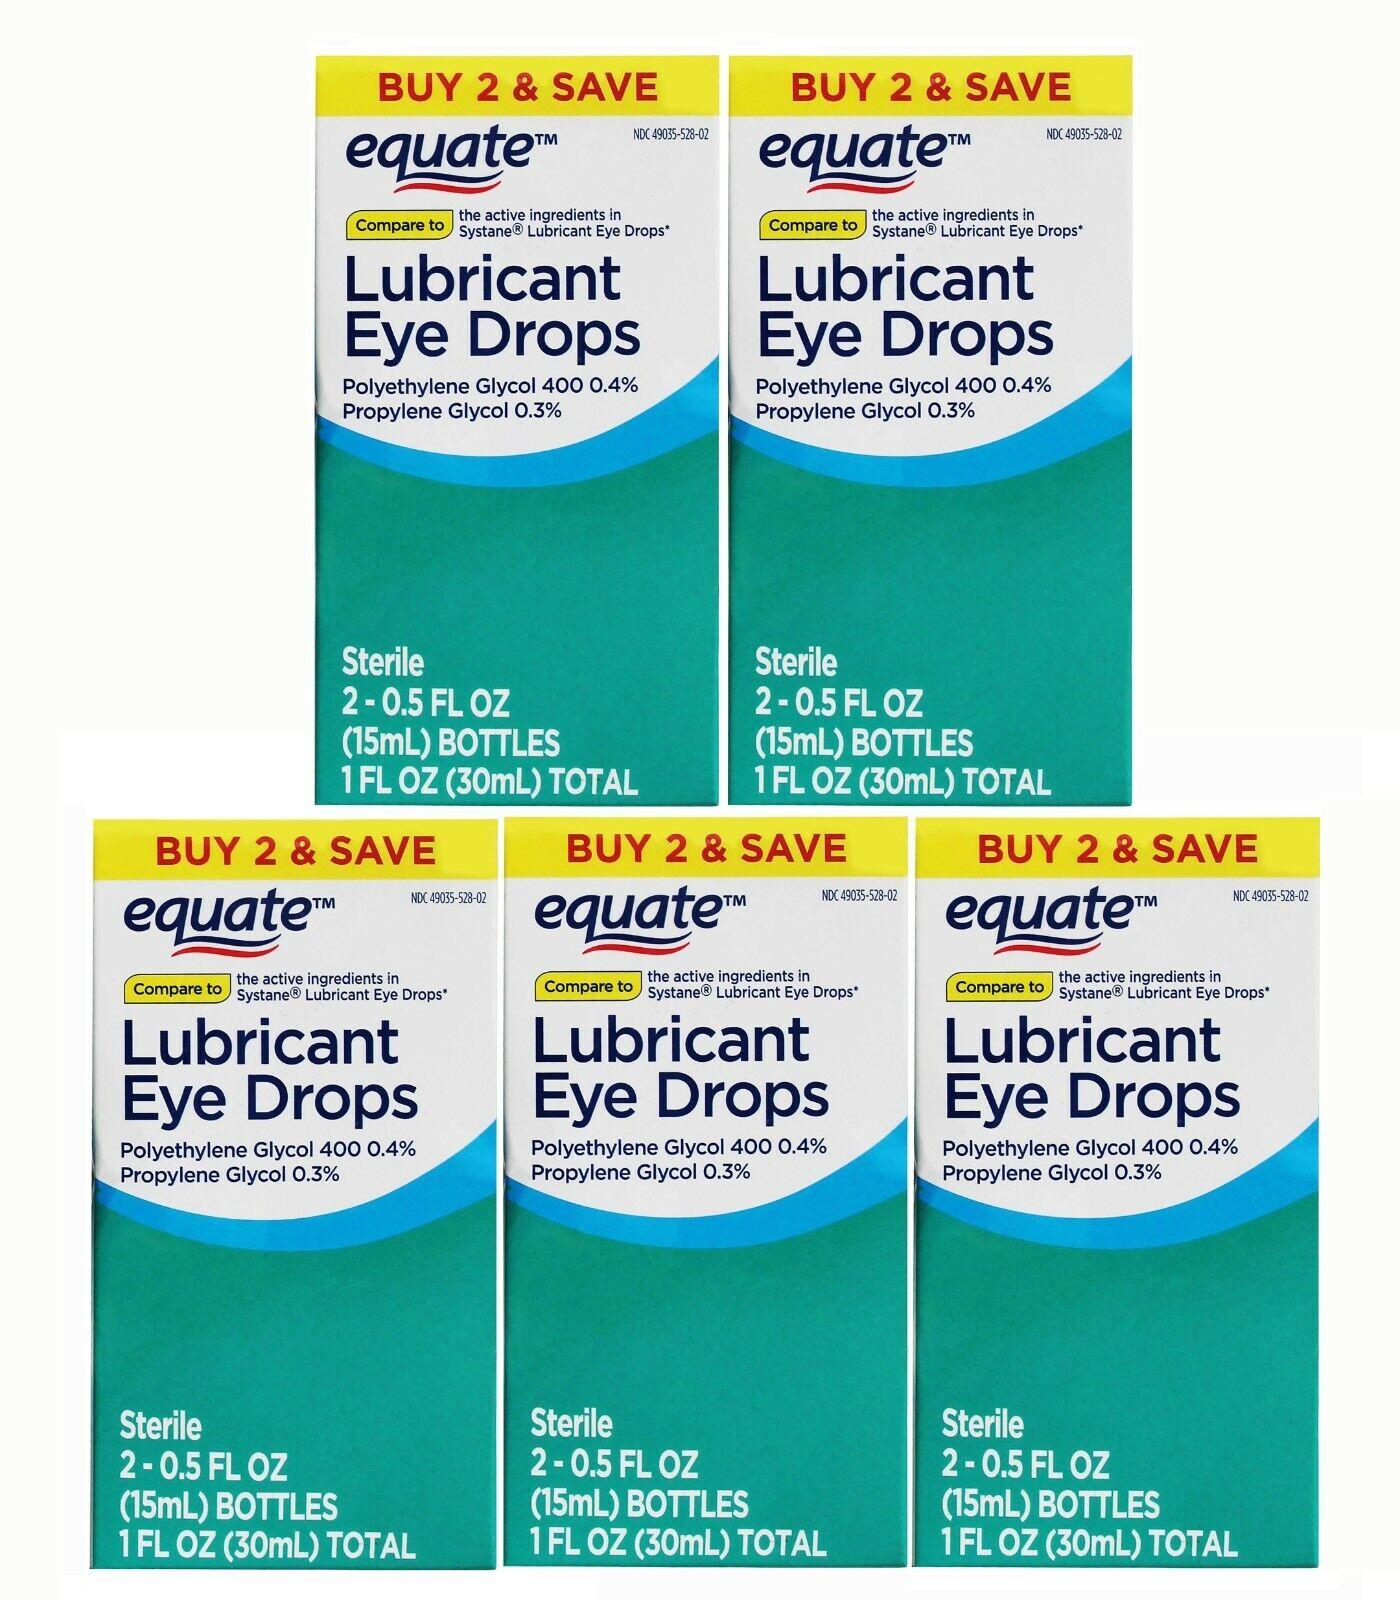 Equate Lubricant Eye Drops, 5 Twin Packs 10 Bottles 0.5 Fl Oz Each EXP 9/2021 - $34.99